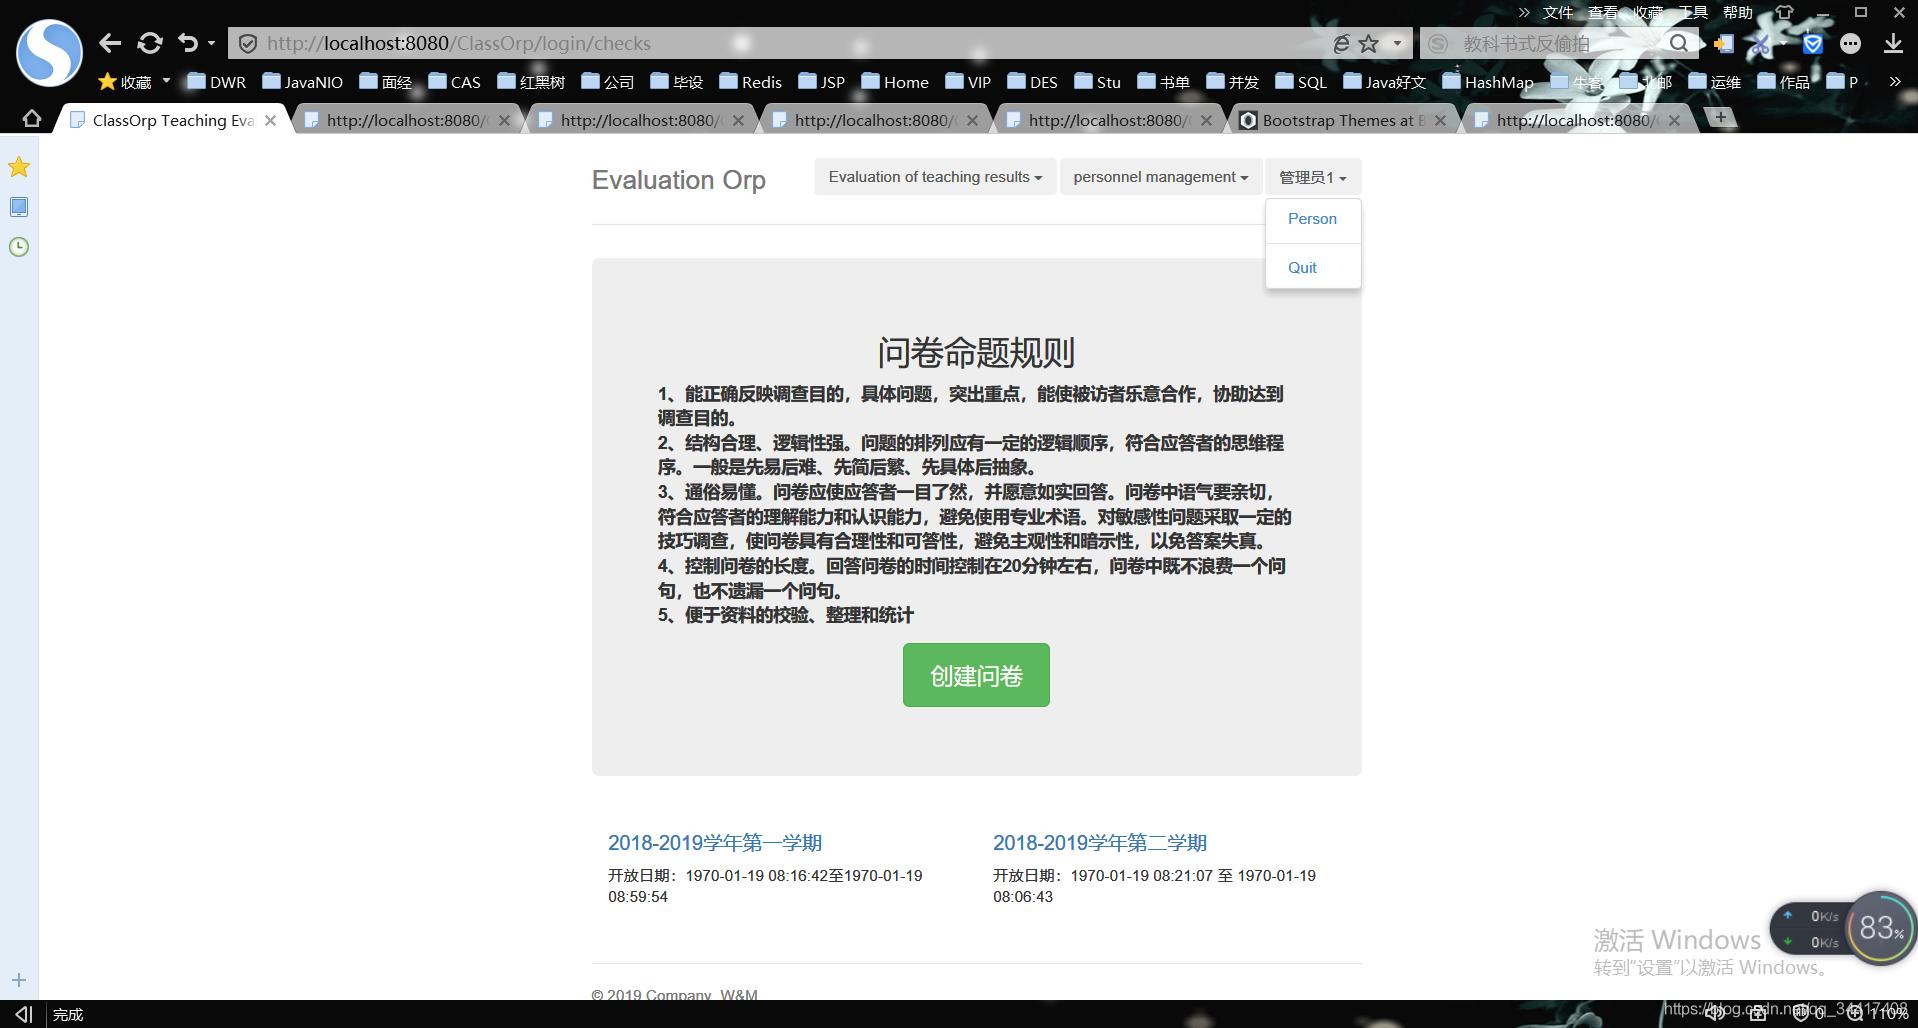 ![Insert picture description here](https://img-blog.csdnimg.cn/20190519130625169.?x-oss-process=image/watermark,type_ZmFuZ3poZW5naGVpdGk,shadow_10,text_aHR0cHM6Ly9ibG9nLmNzZG4ubmV0L3FFt_colort_color_de,size_zmV0L3